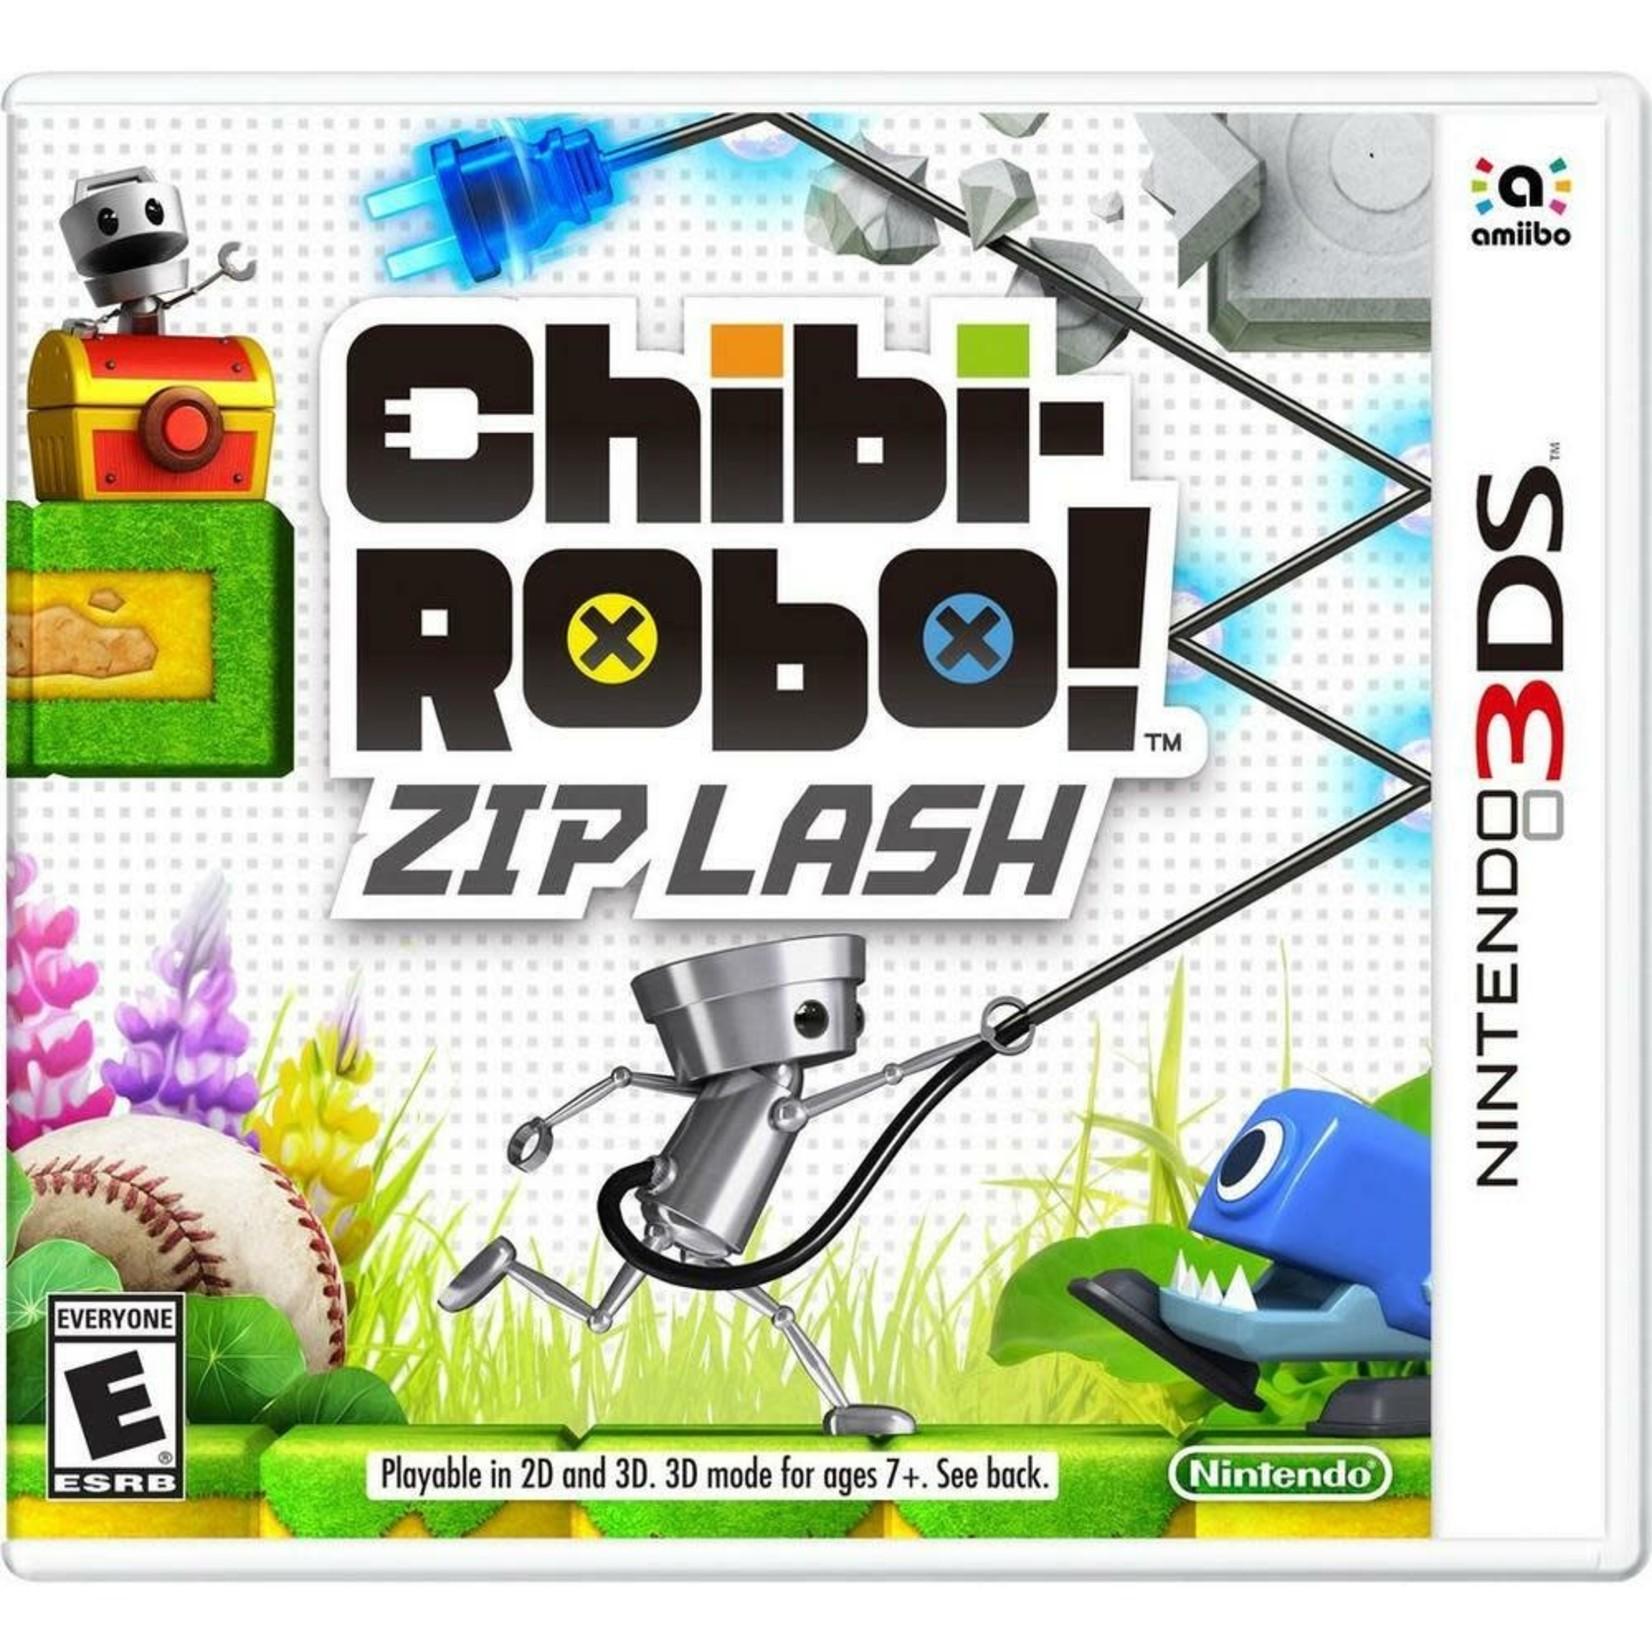 3DS-Chibi-Robo! Zip Lash